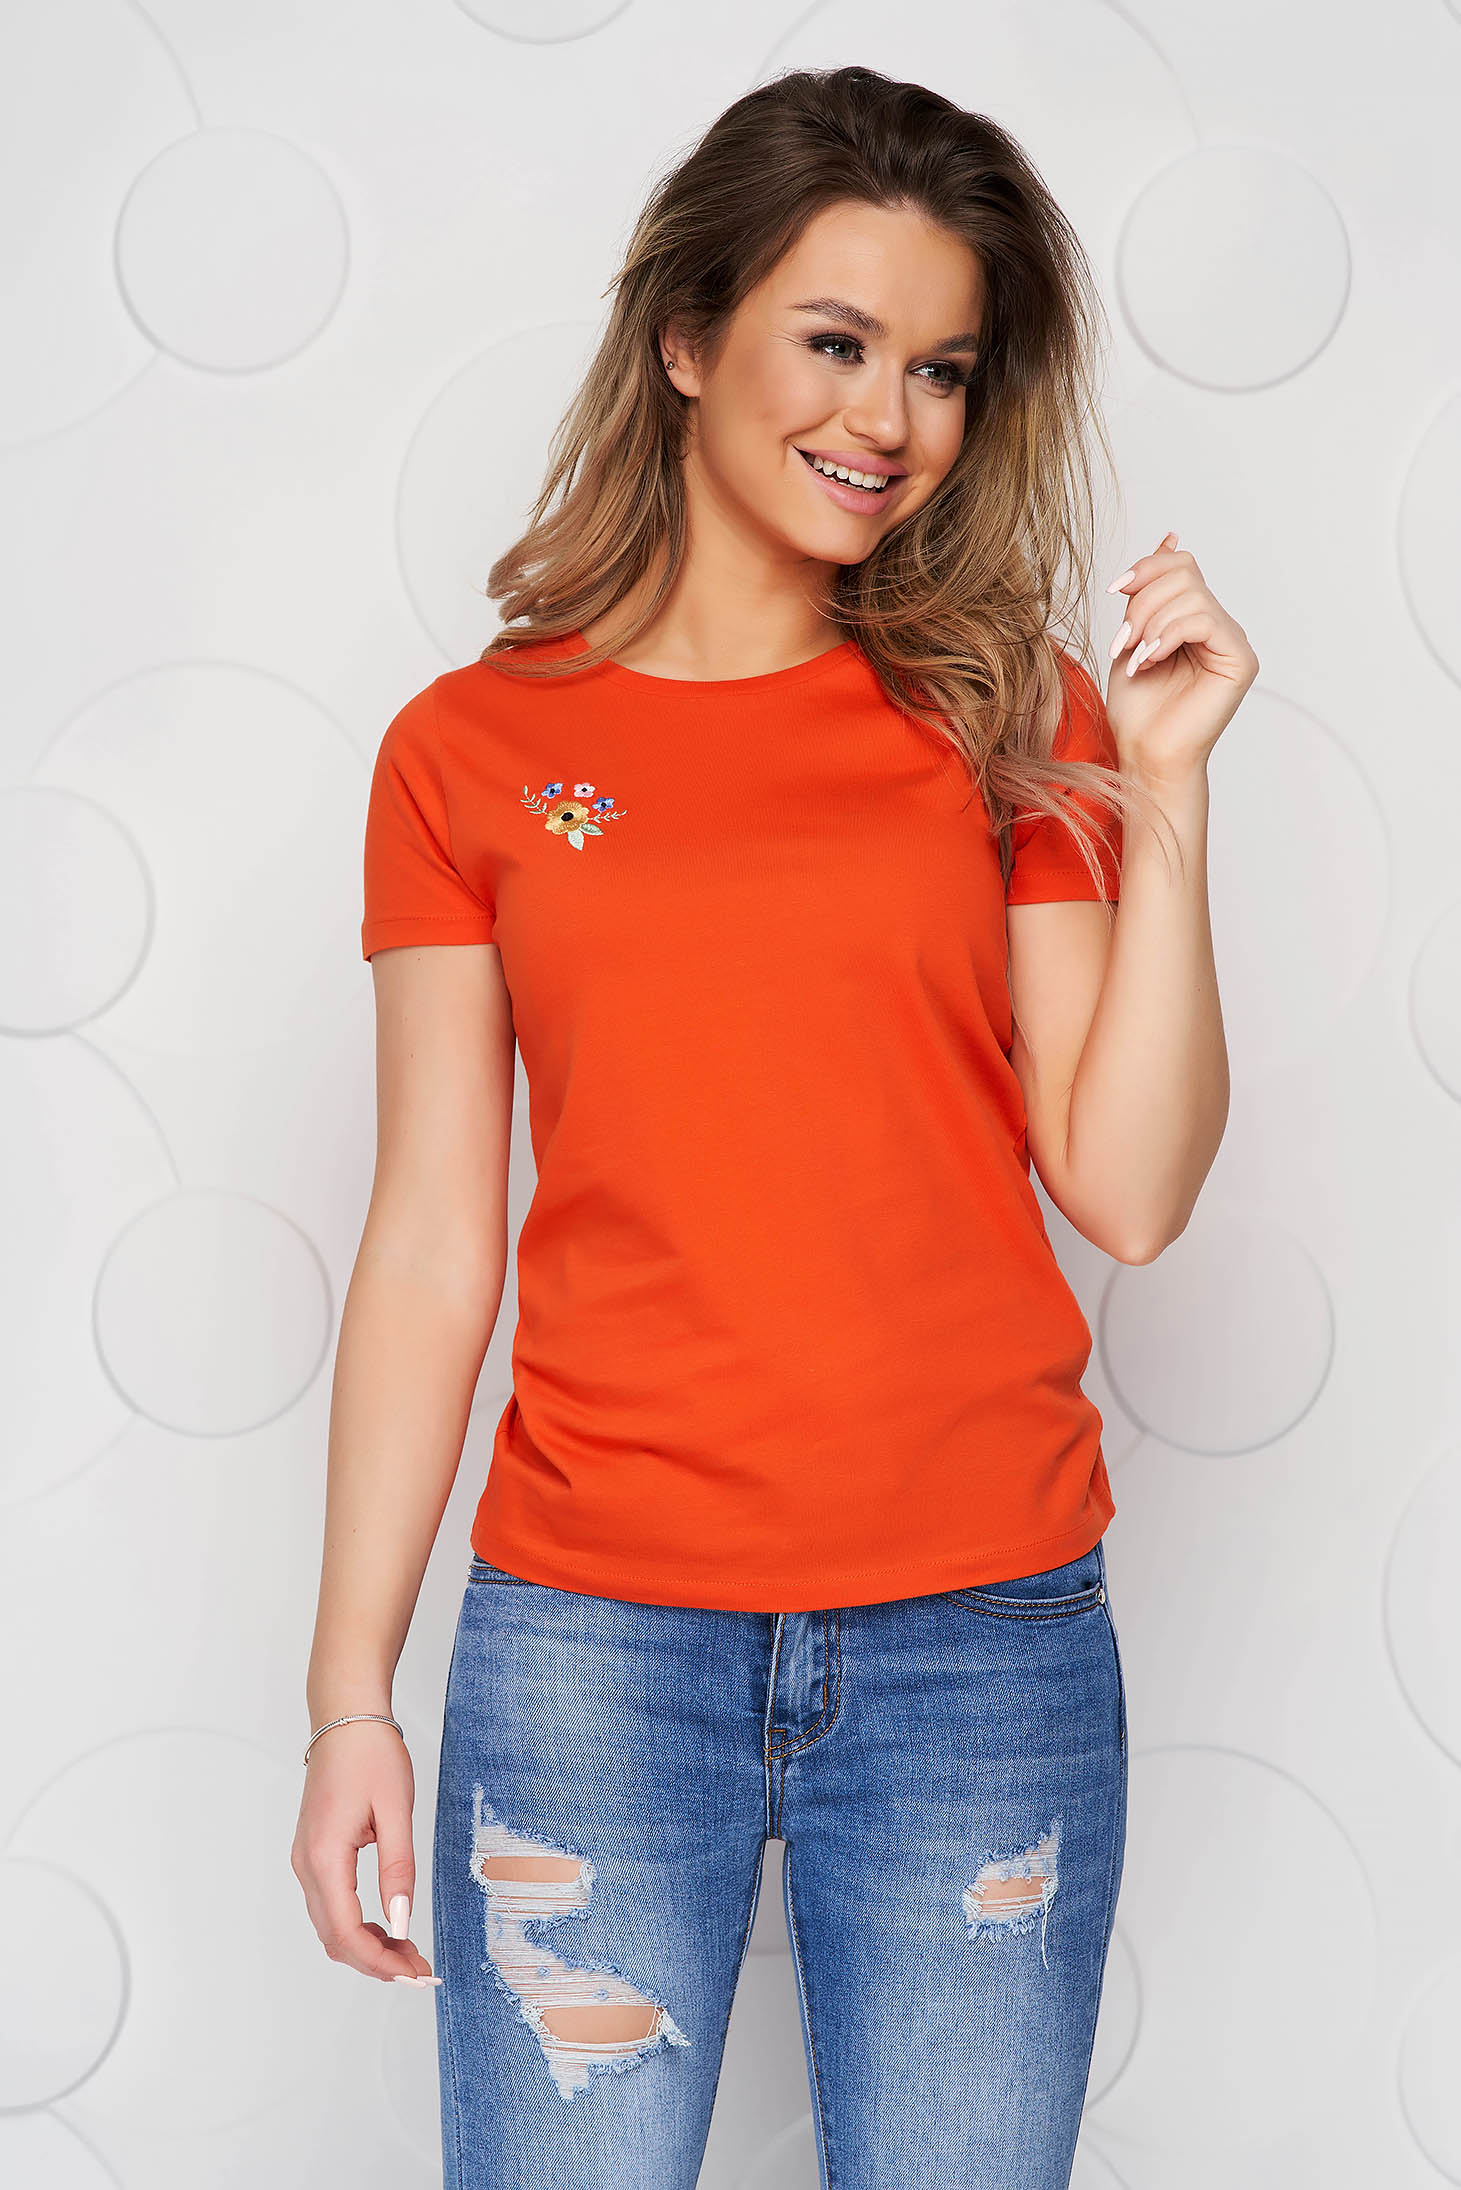 Orange StarShinerS t-shirt cotton loose fit